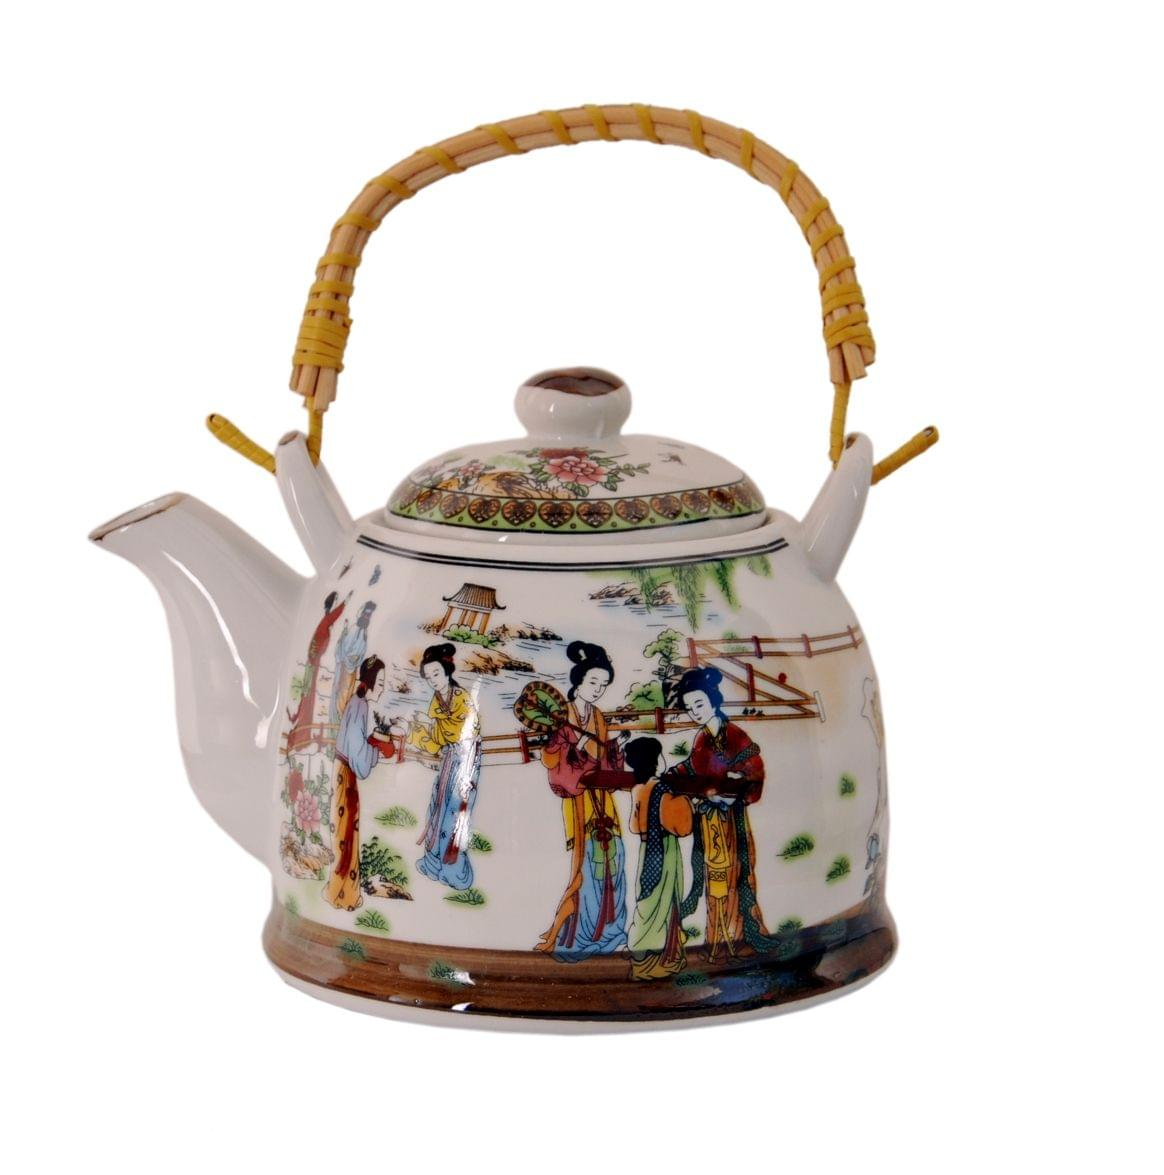 Decorative Watering Cans Purpledip Ceramic Fire Kettle Gossip Time 1l Tea Pot